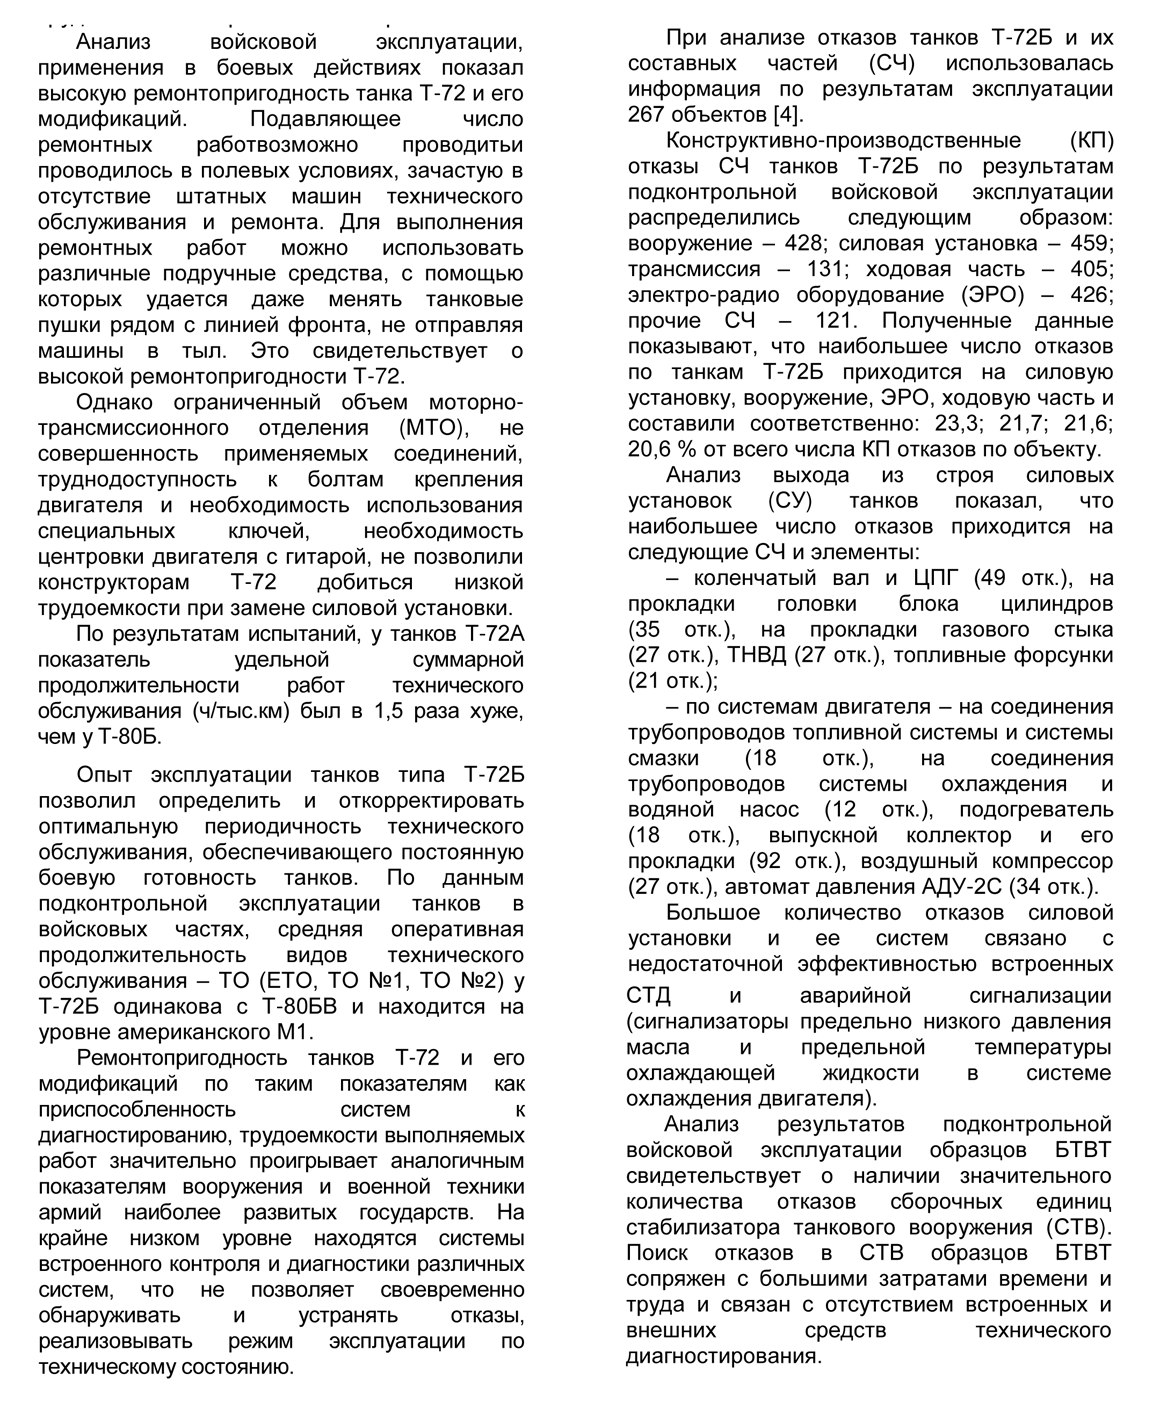 https://pp.userapi.com/c621700/v621700315/226f5/rYSgTV_7_nQ.jpg